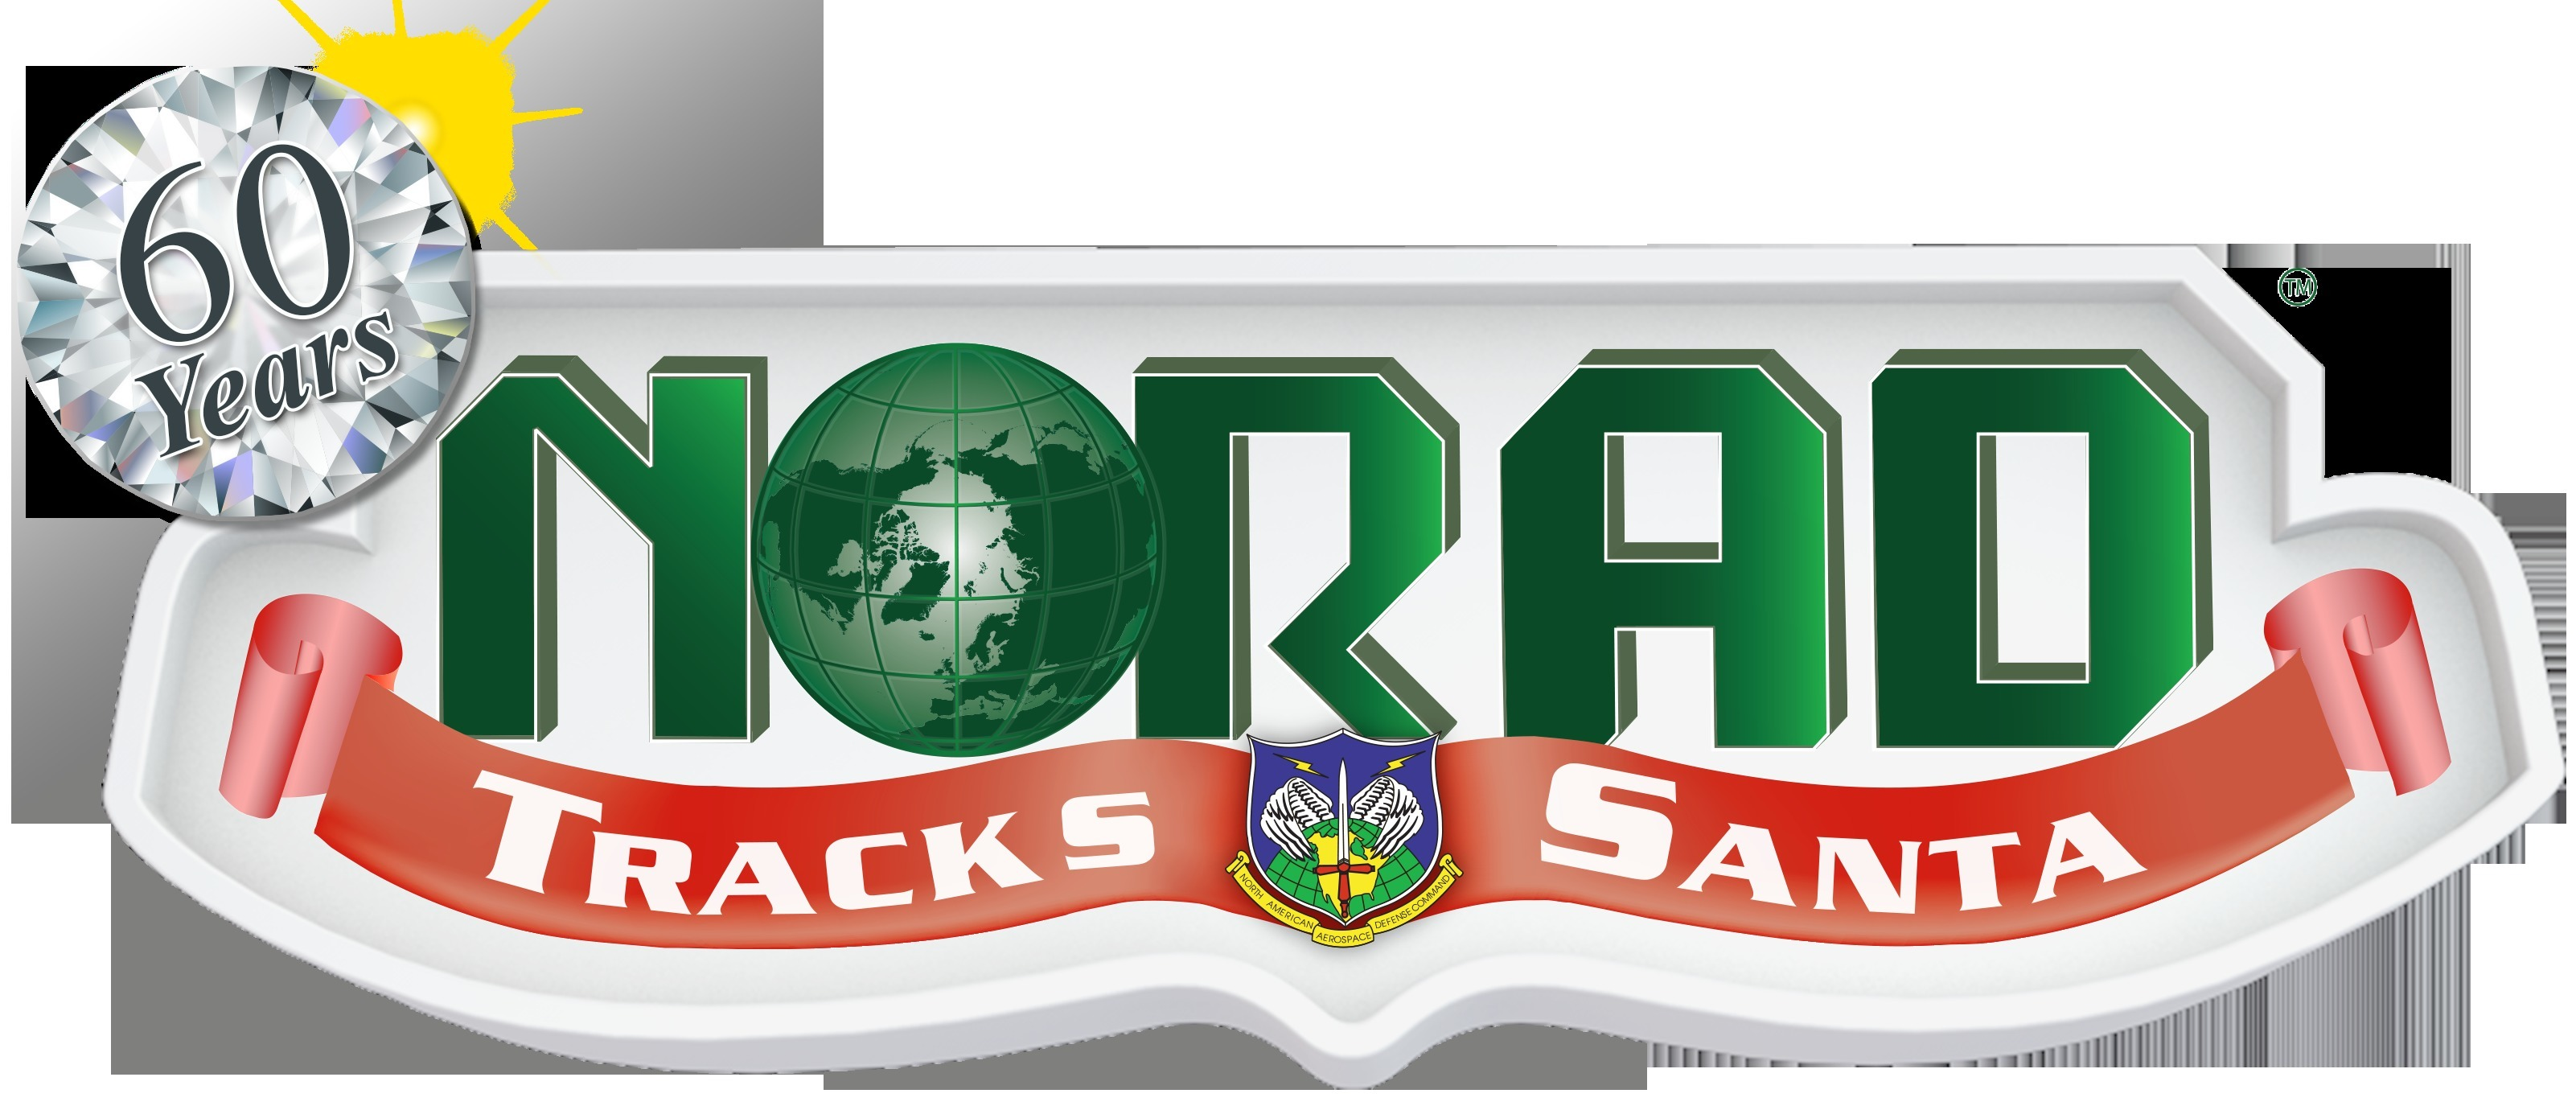 ada0d87014c7312981ef_NTS-60th-Anniversary-logo-hires.jpg